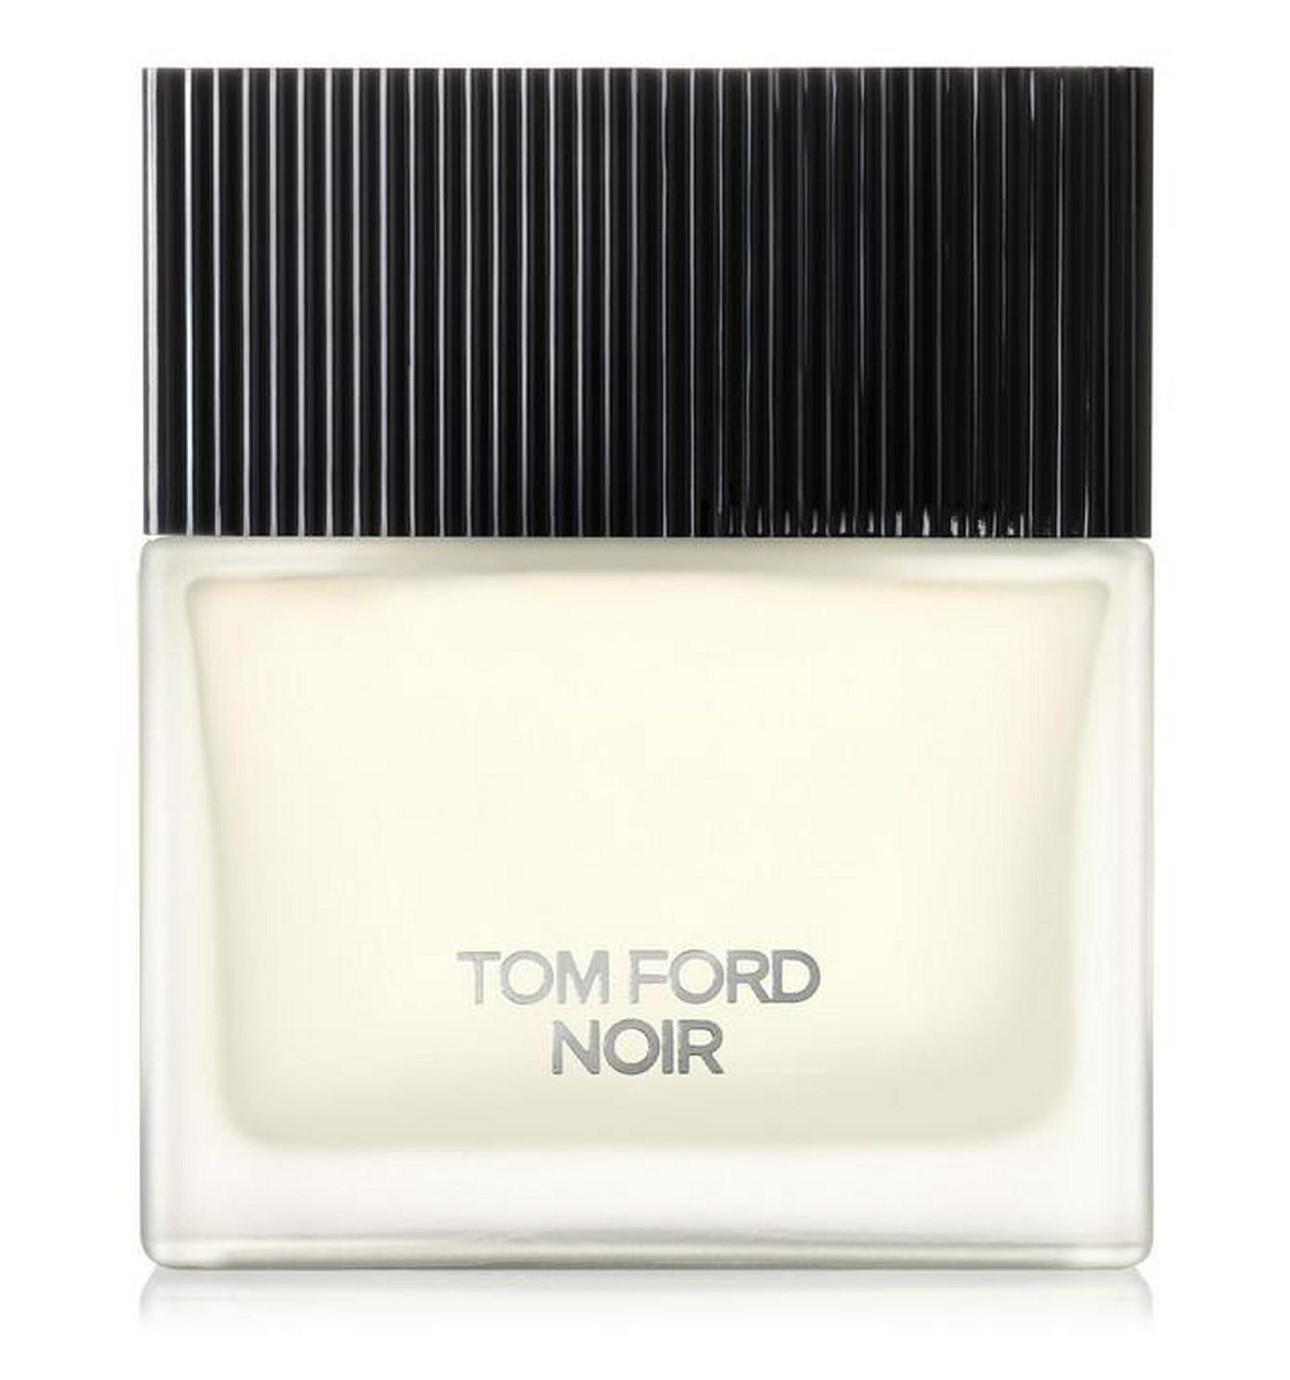 products express ford noir perfume tom tomfordnoir